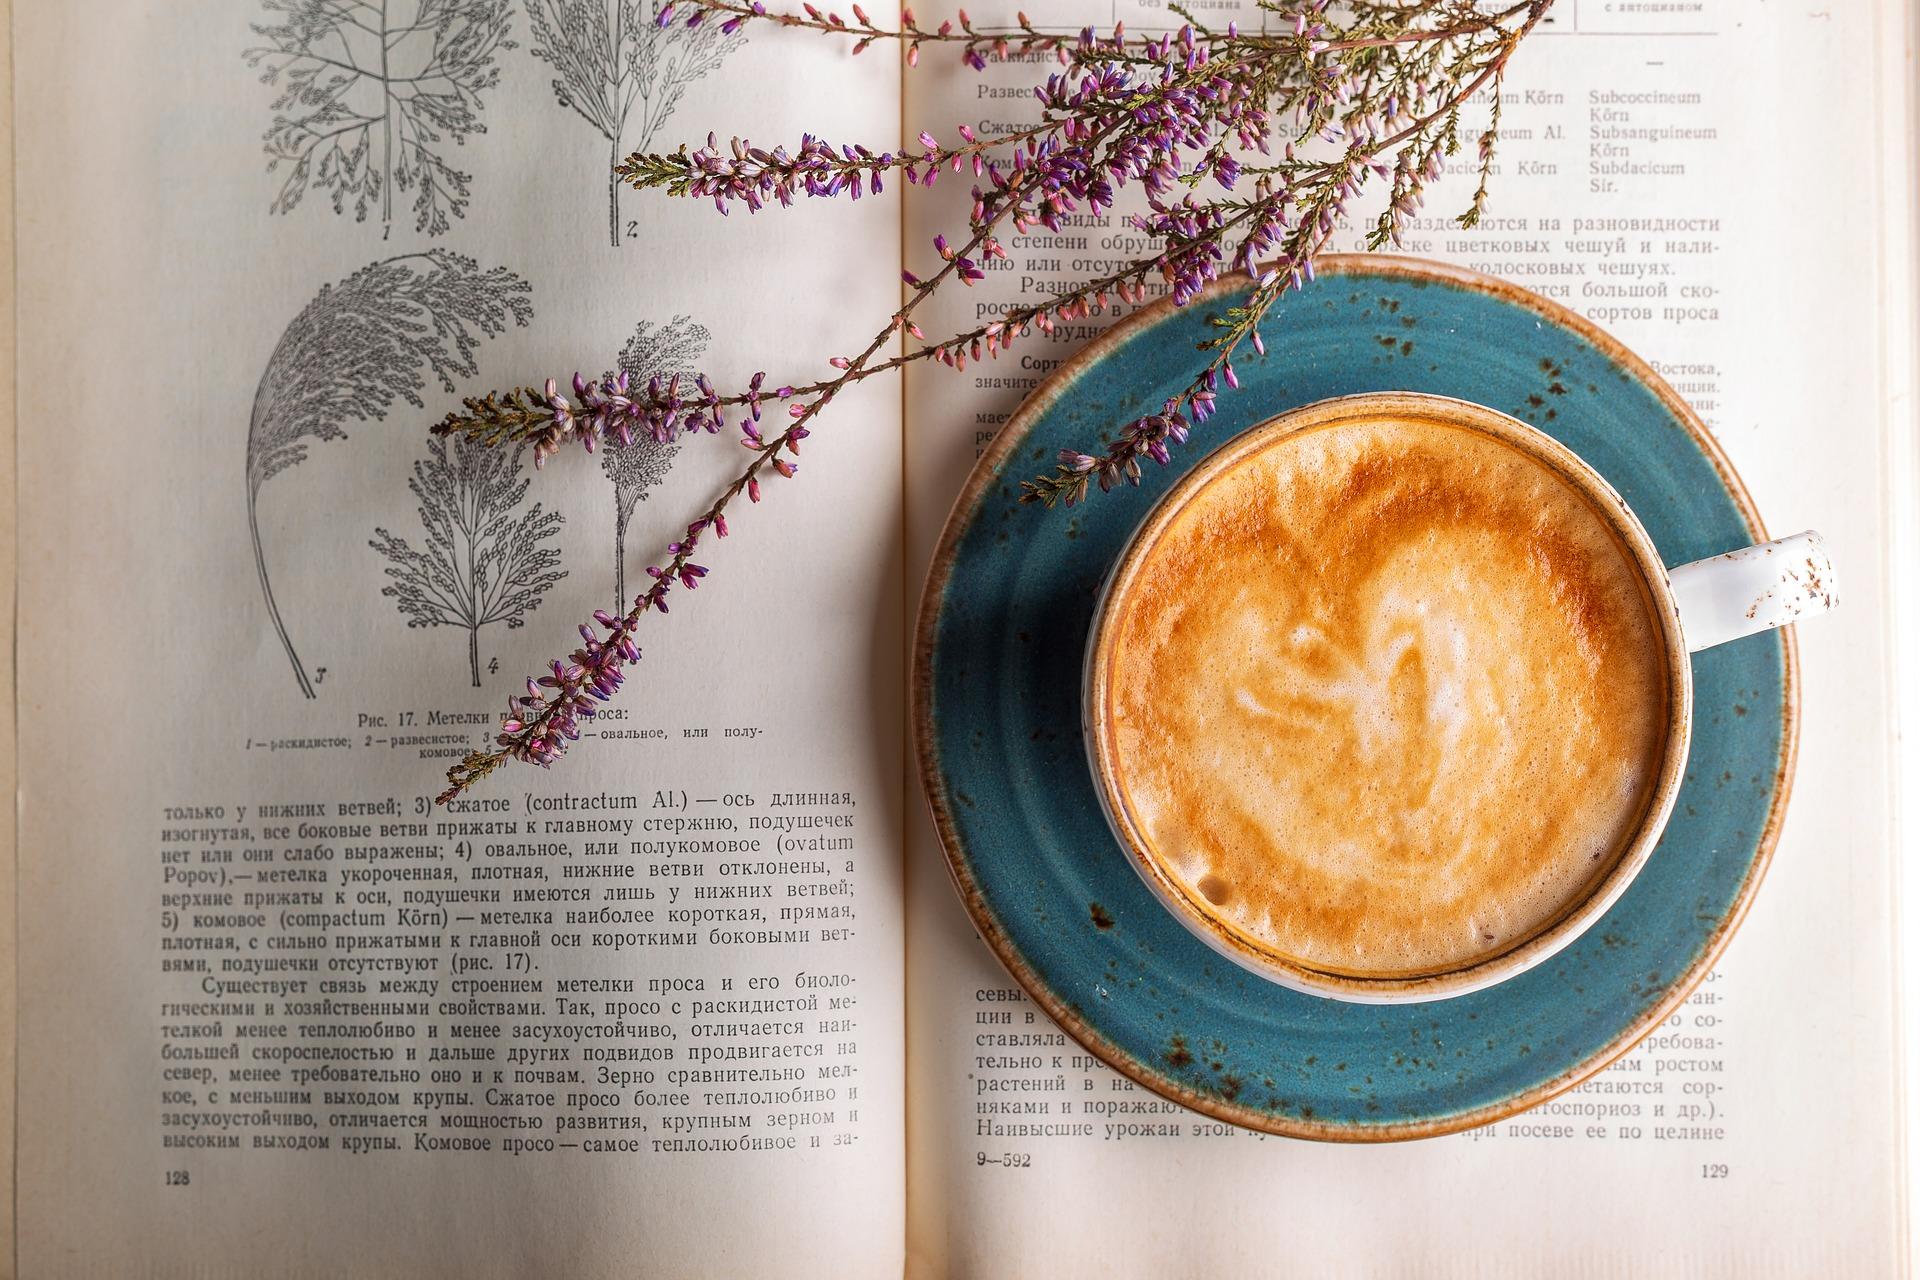 coffee-2151200_1920.jpg